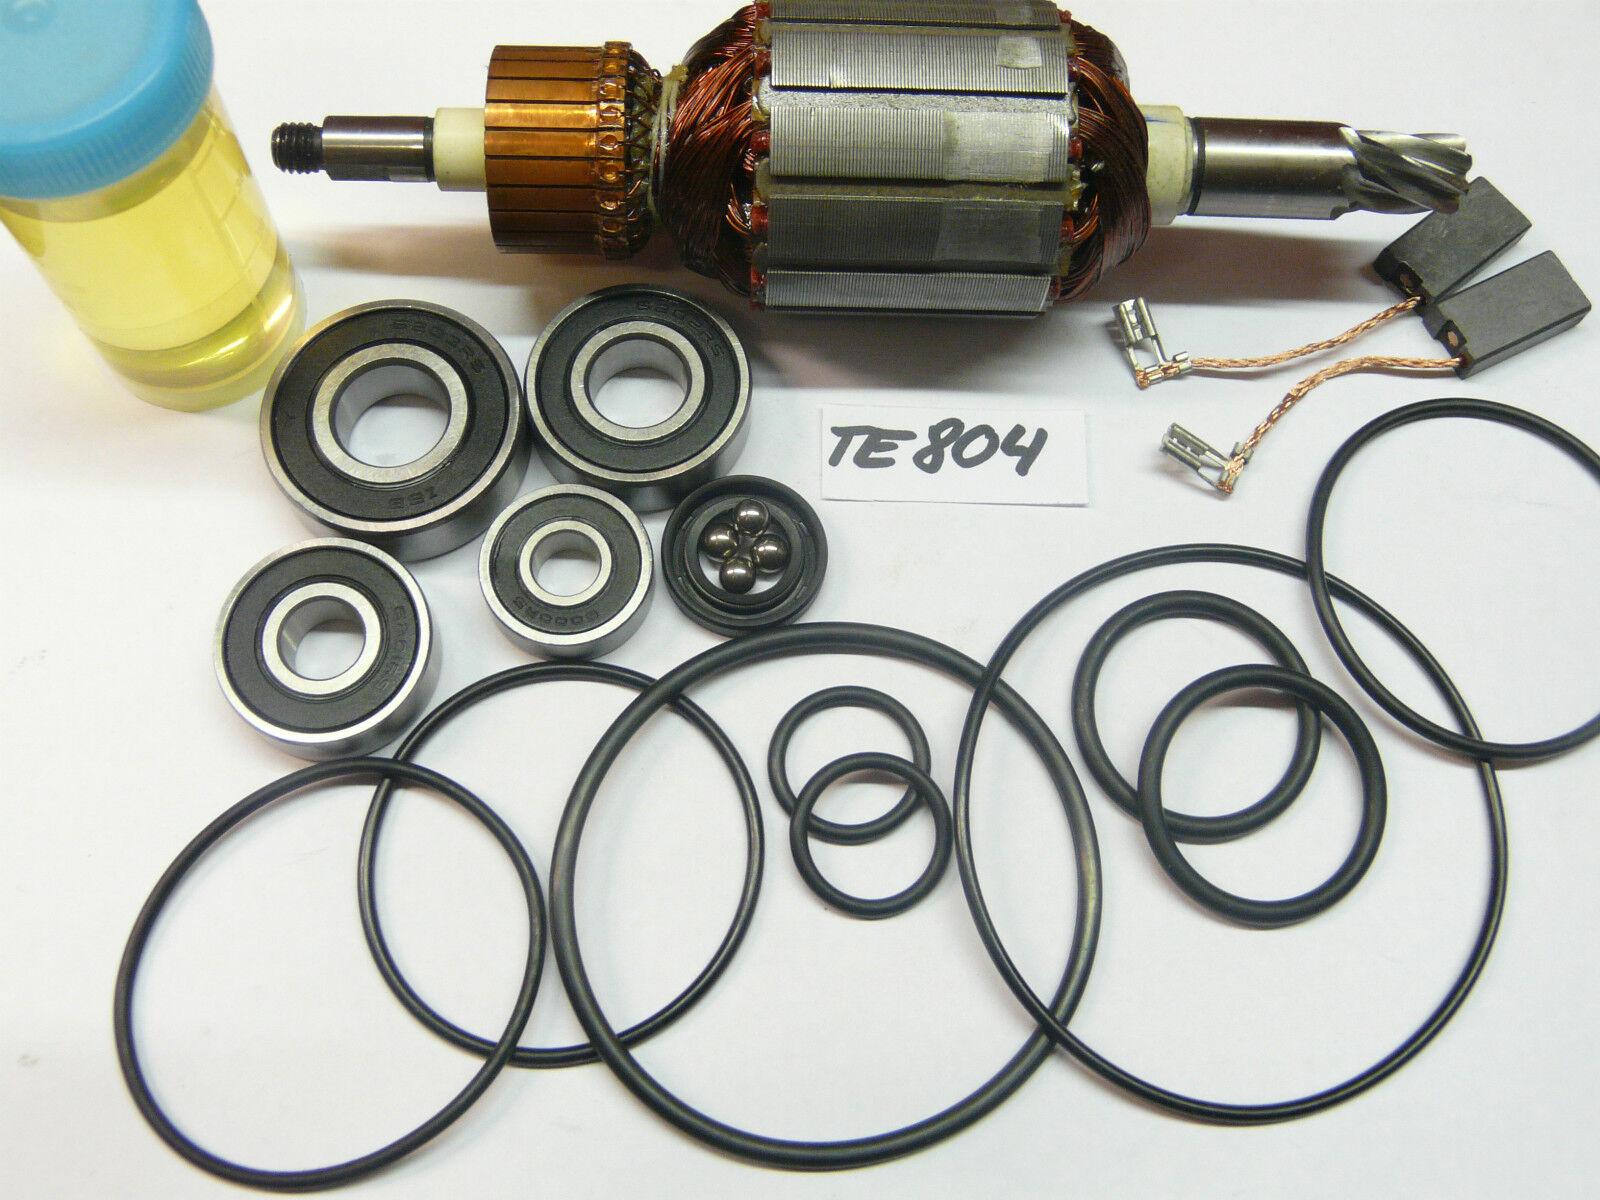 Anker, Rotor für Hilti TE 804 mit Reparatursatz